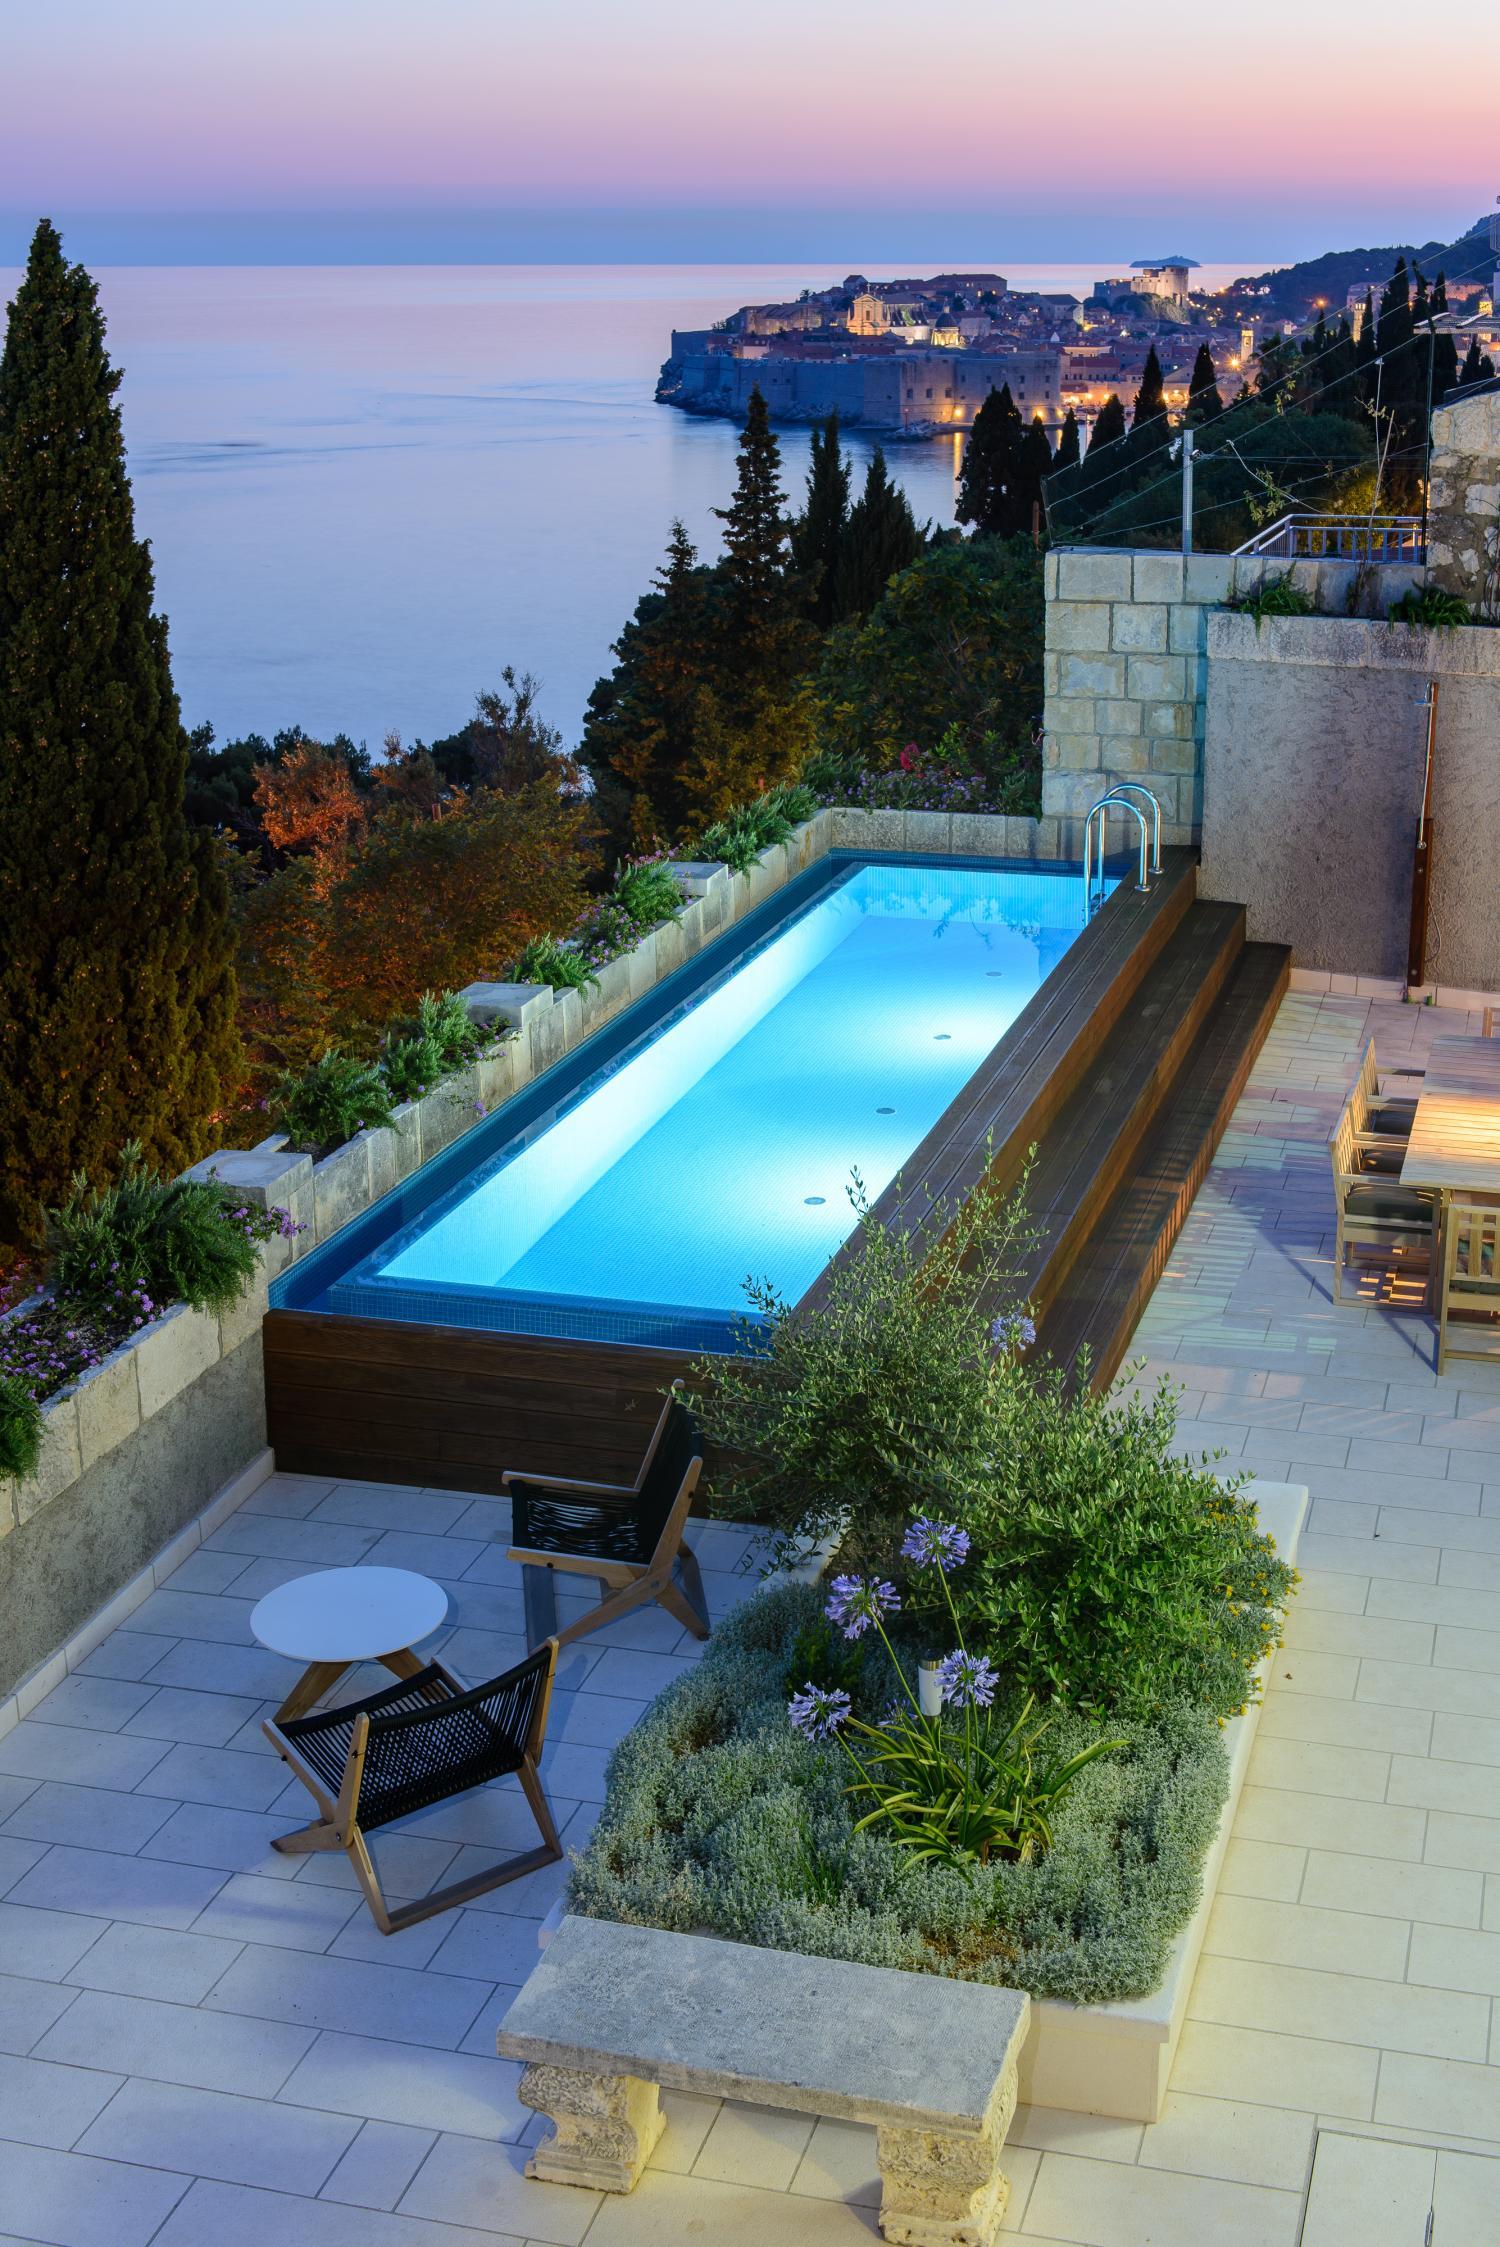 Croatia, Dubrovnik Riviera, Dubrovnik, villa Lucija, pool and views